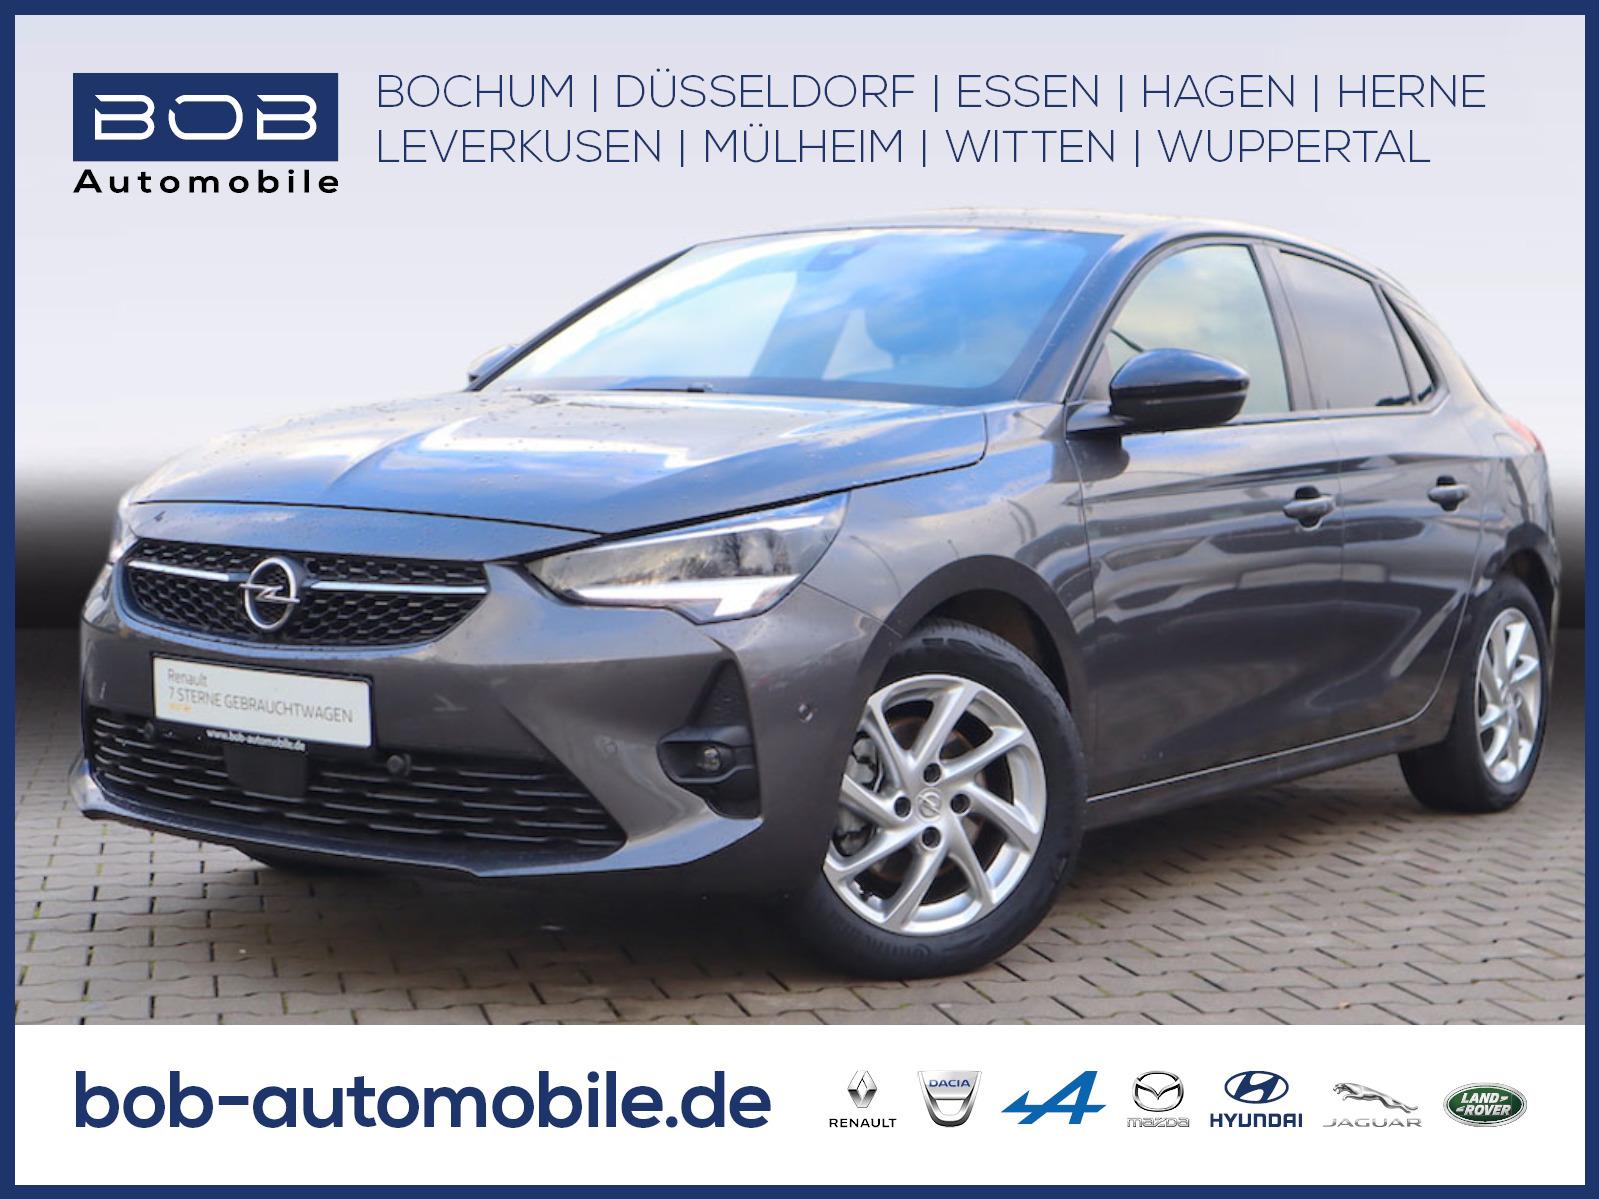 Opel Corsa 1.2 GS Line PDC KAMERA LM, Jahr 2020, Benzin